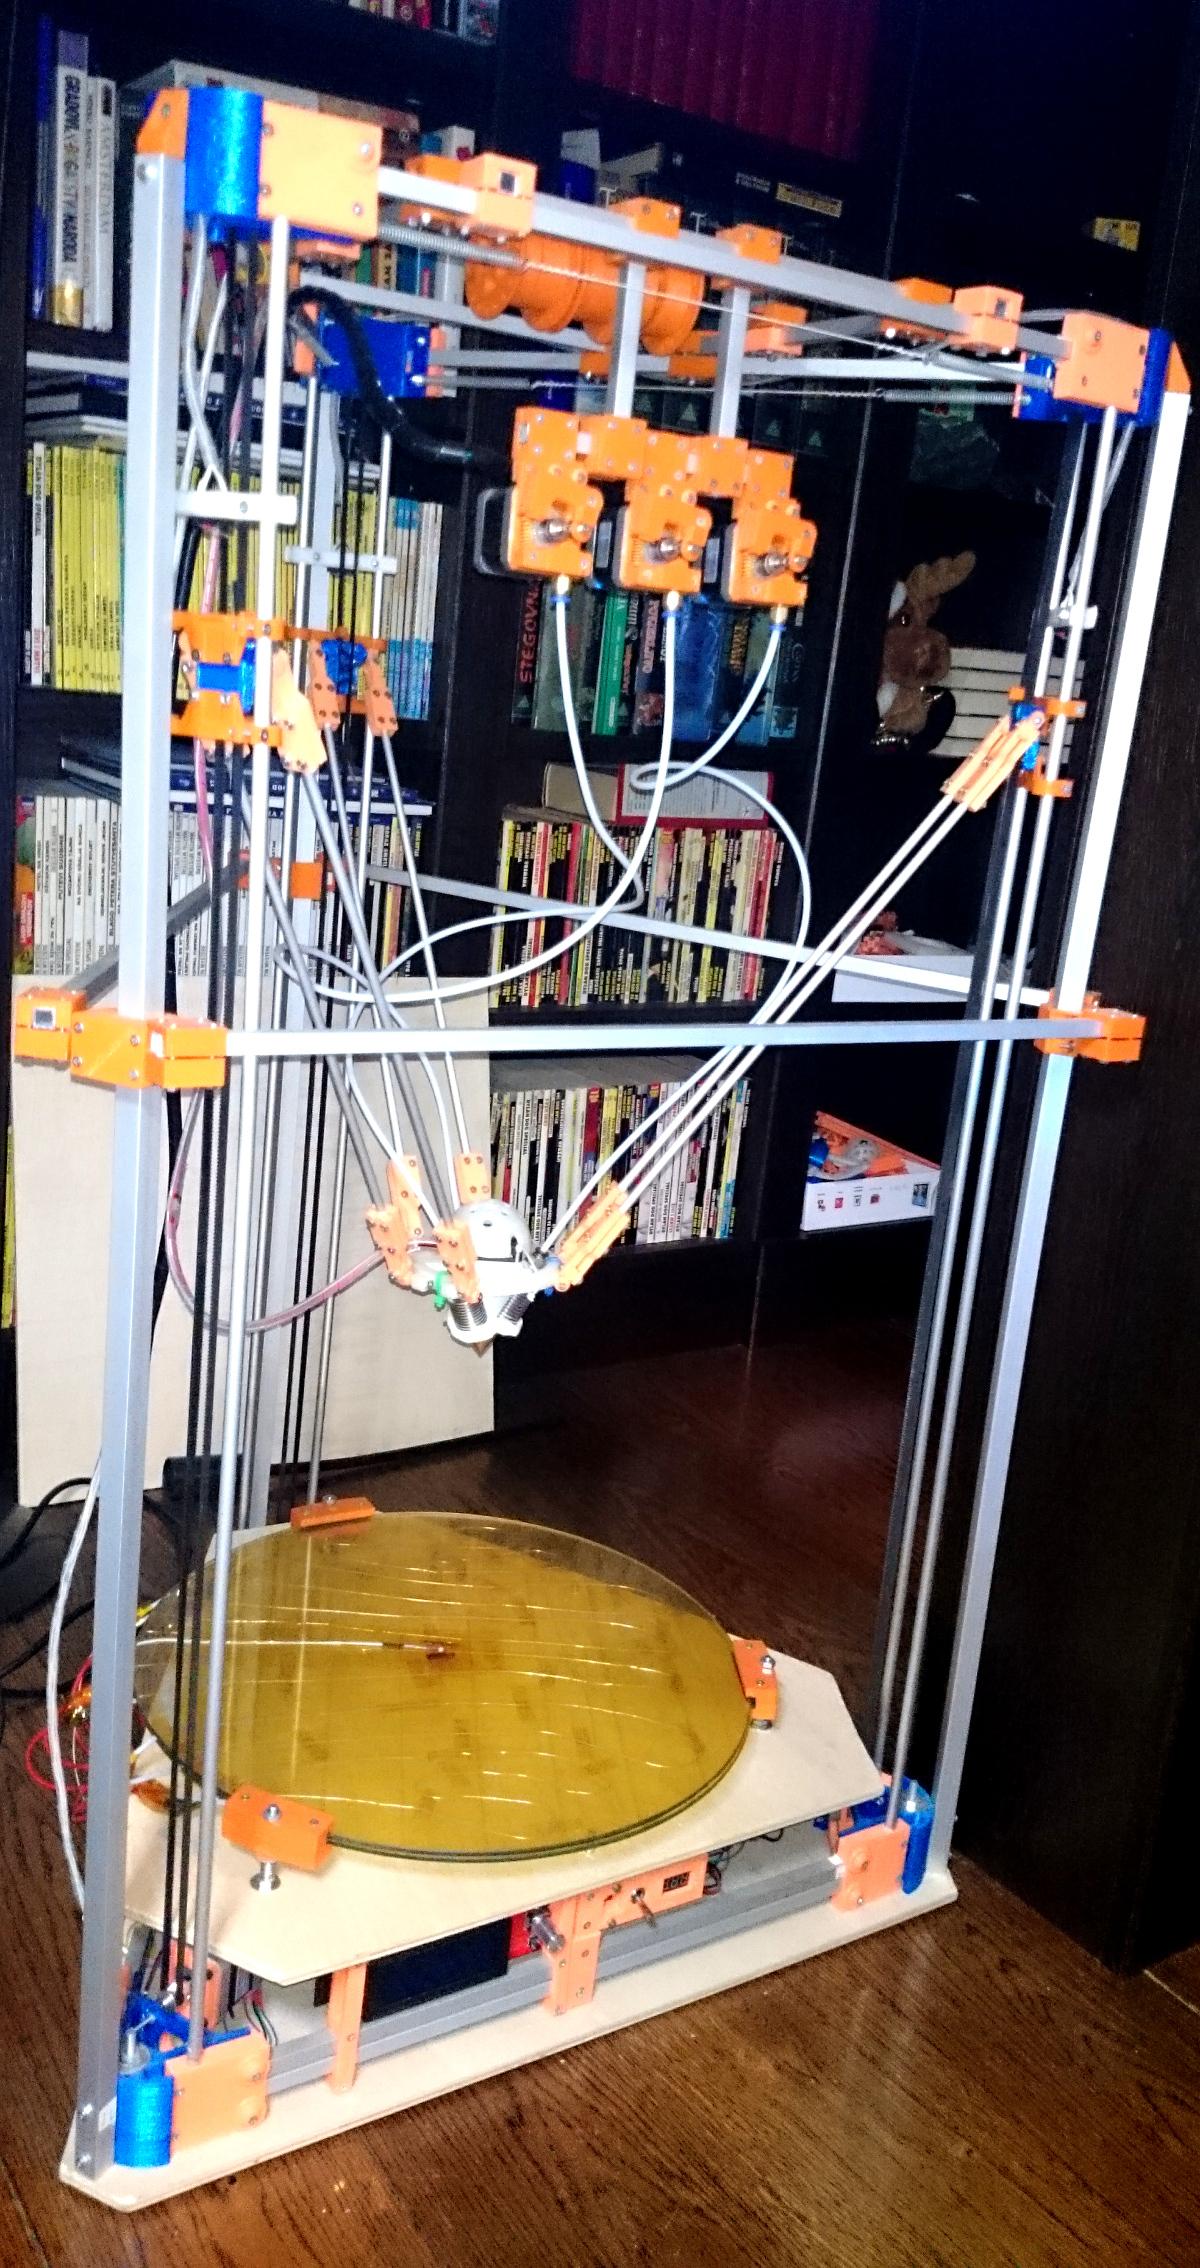 delta 3d printer meta.frame.xl v2.0